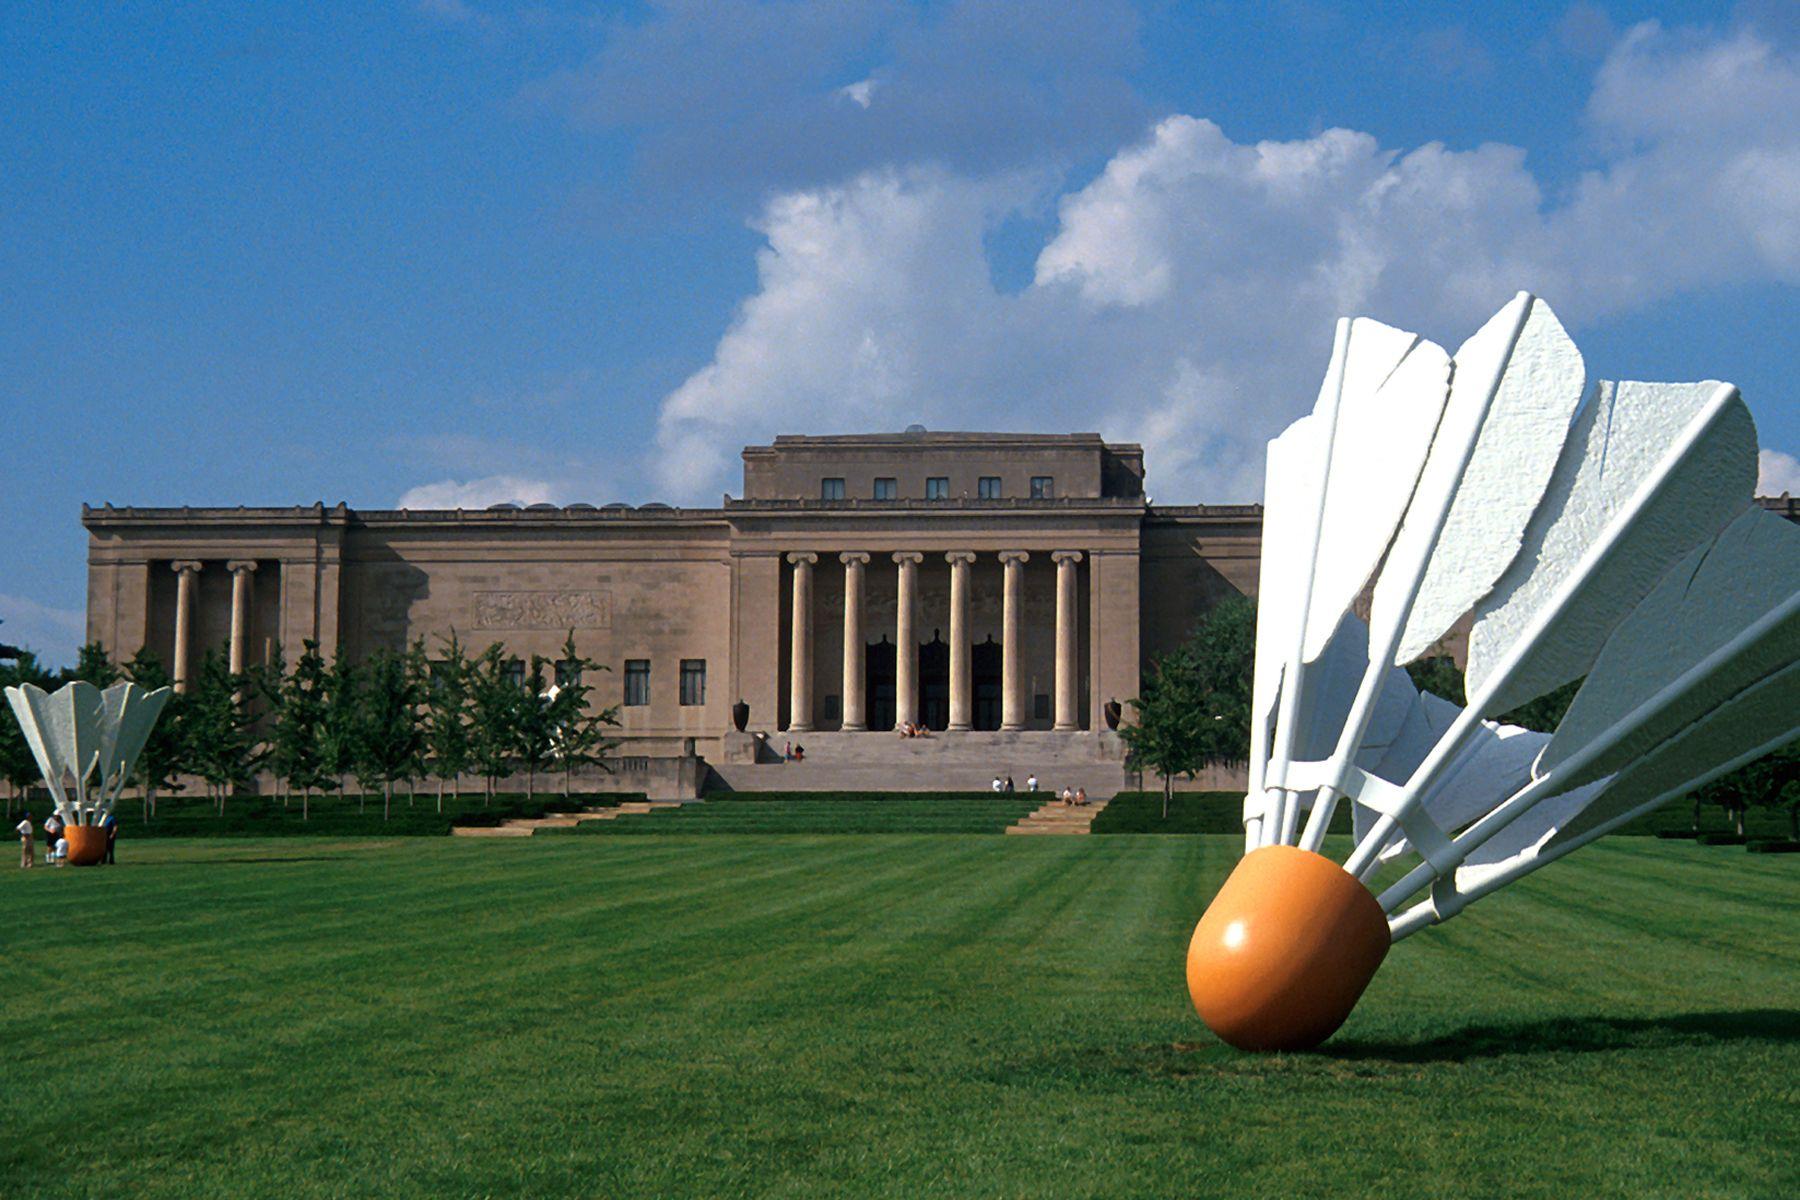 Kansas City Kansas The Lawn Of The Nelson Atkins Museum Of Art Resembles A Badminton Court With Sculptures Kansas City Missouri Kansas City Kansas Missouri